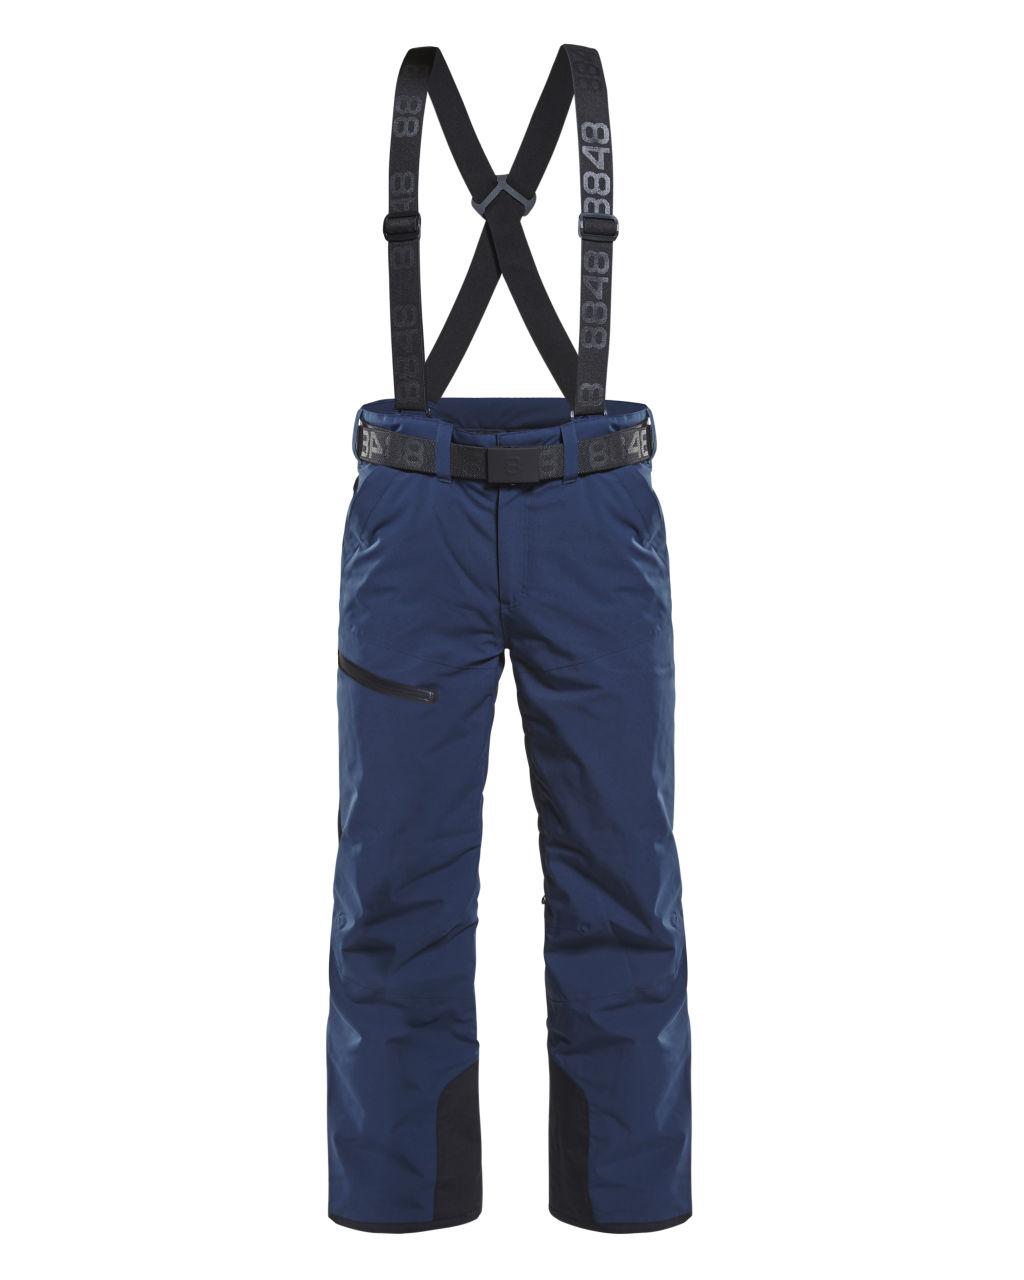 8848 Altitude Cadore Ski Pants M - Miesten toppahousut - Intersport b283875299